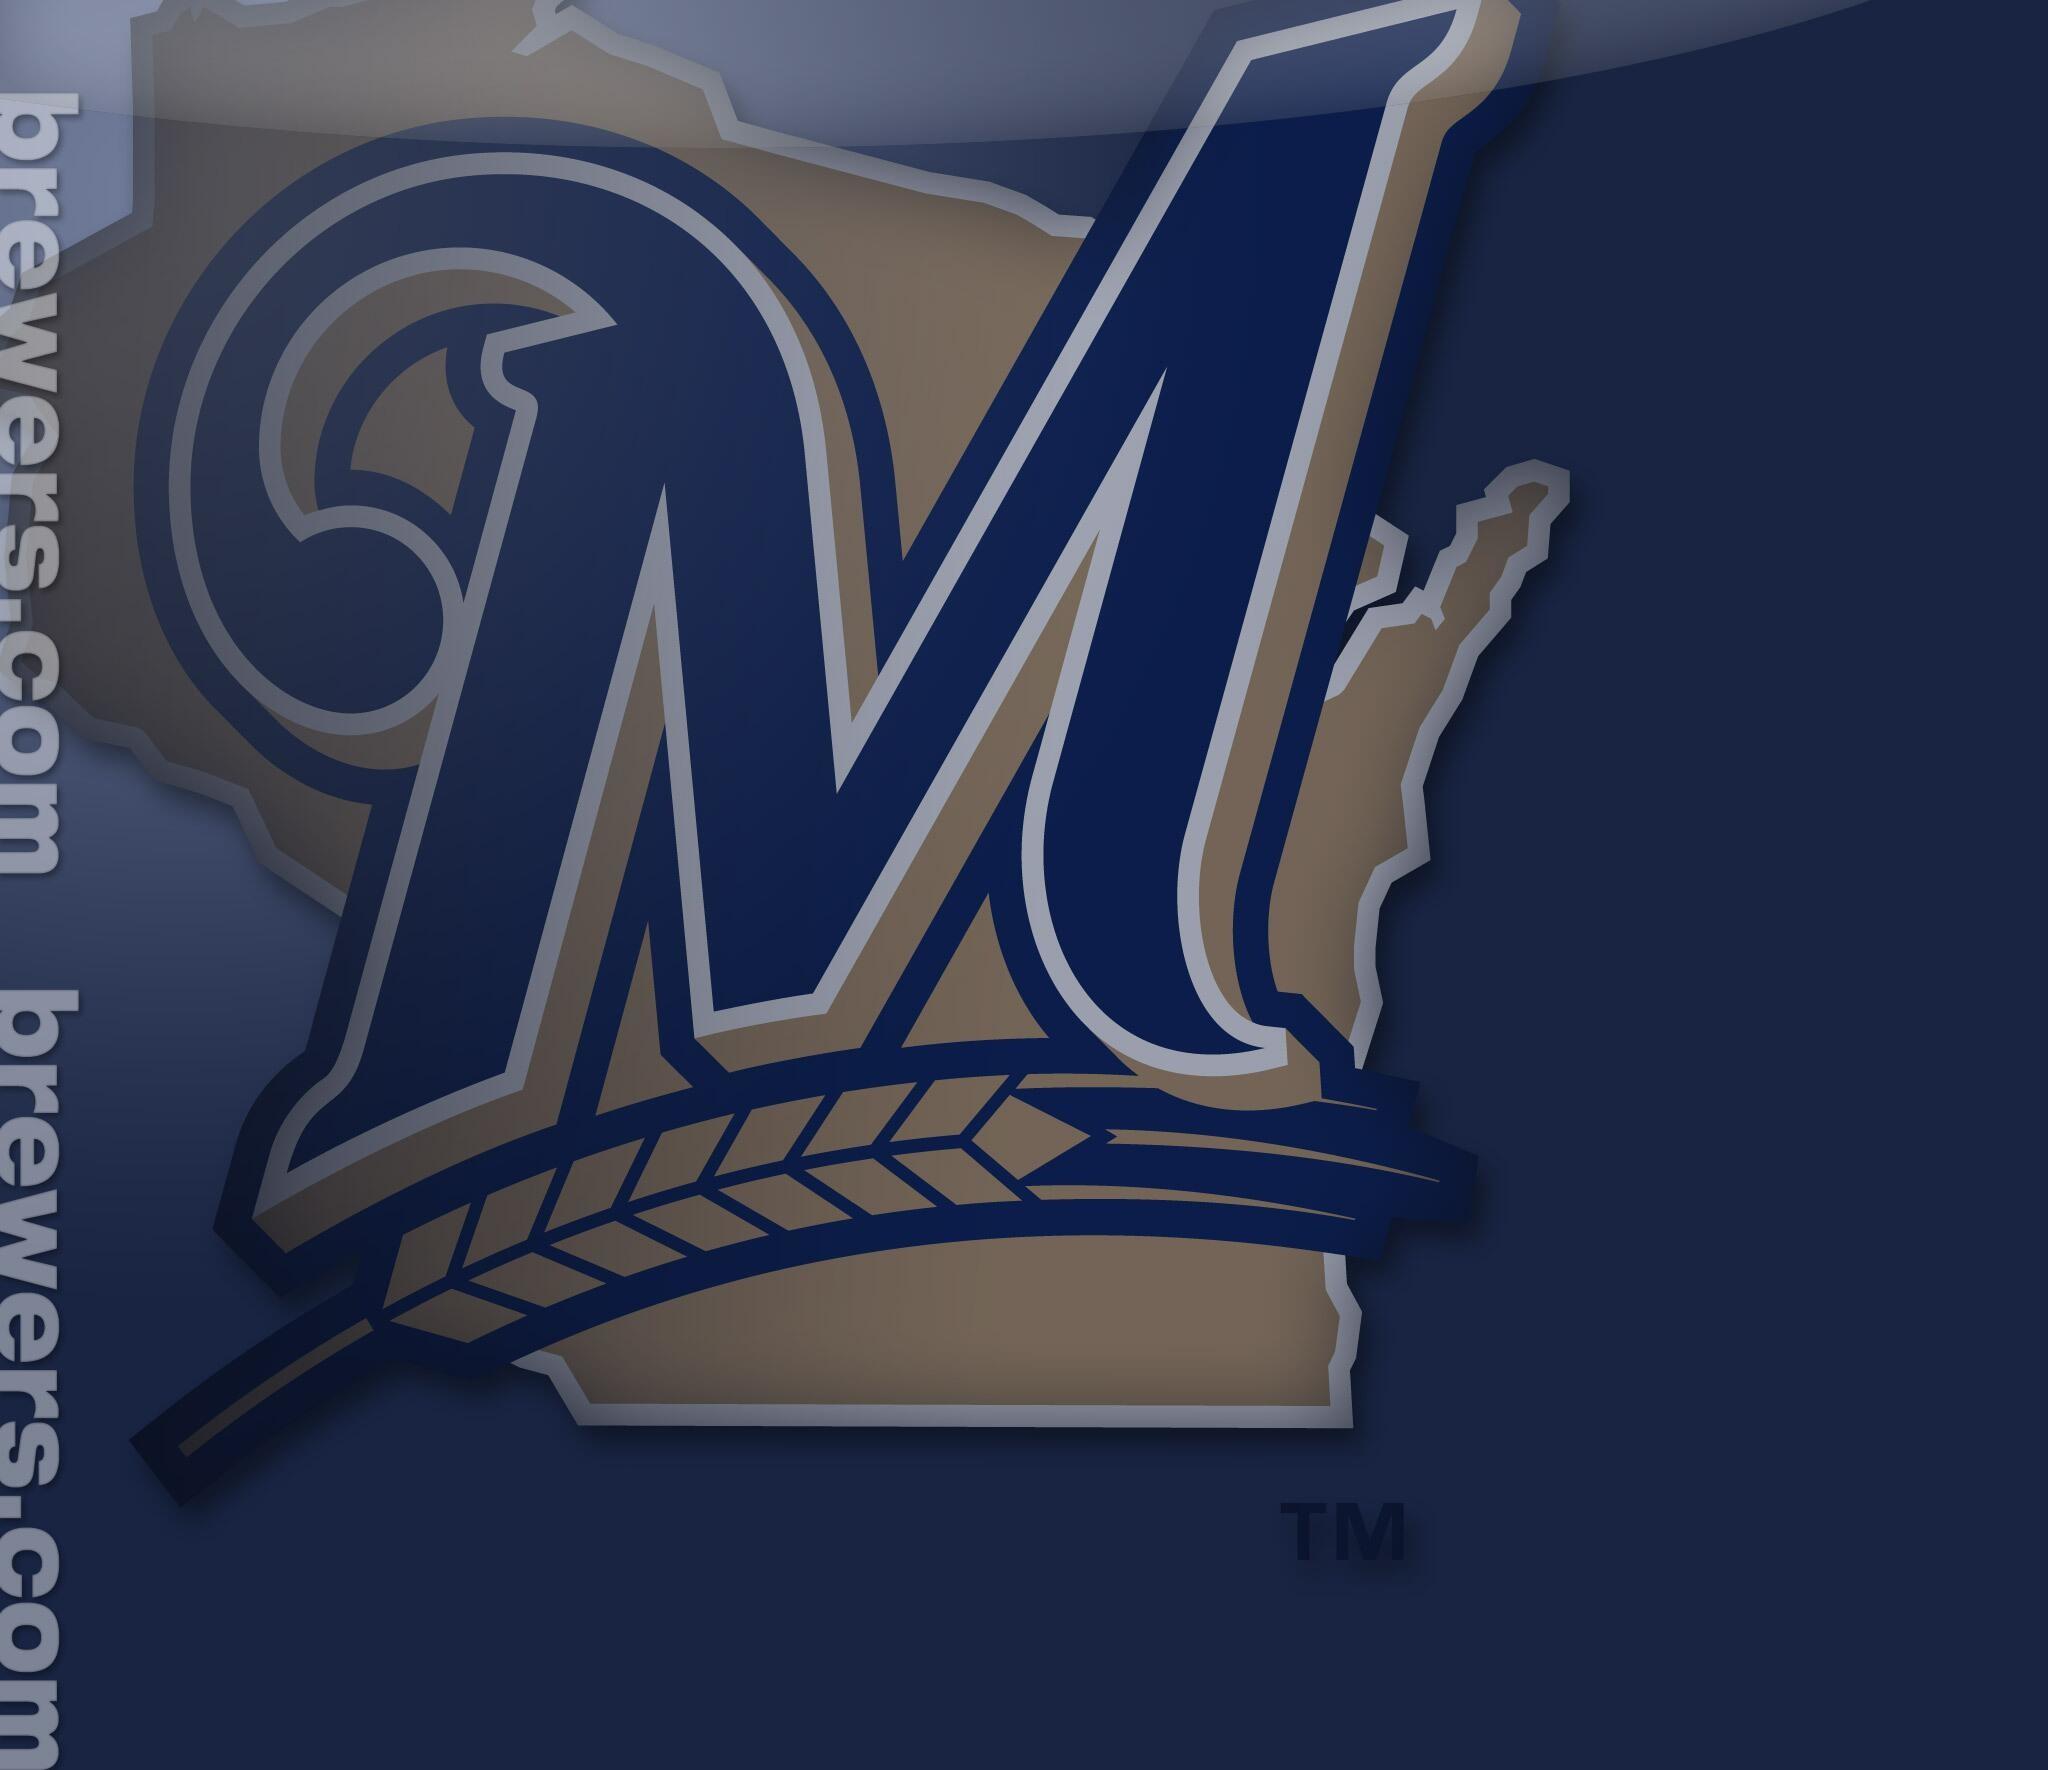 Milwaukee Brewers Wallpaper Desktop (51+ Images